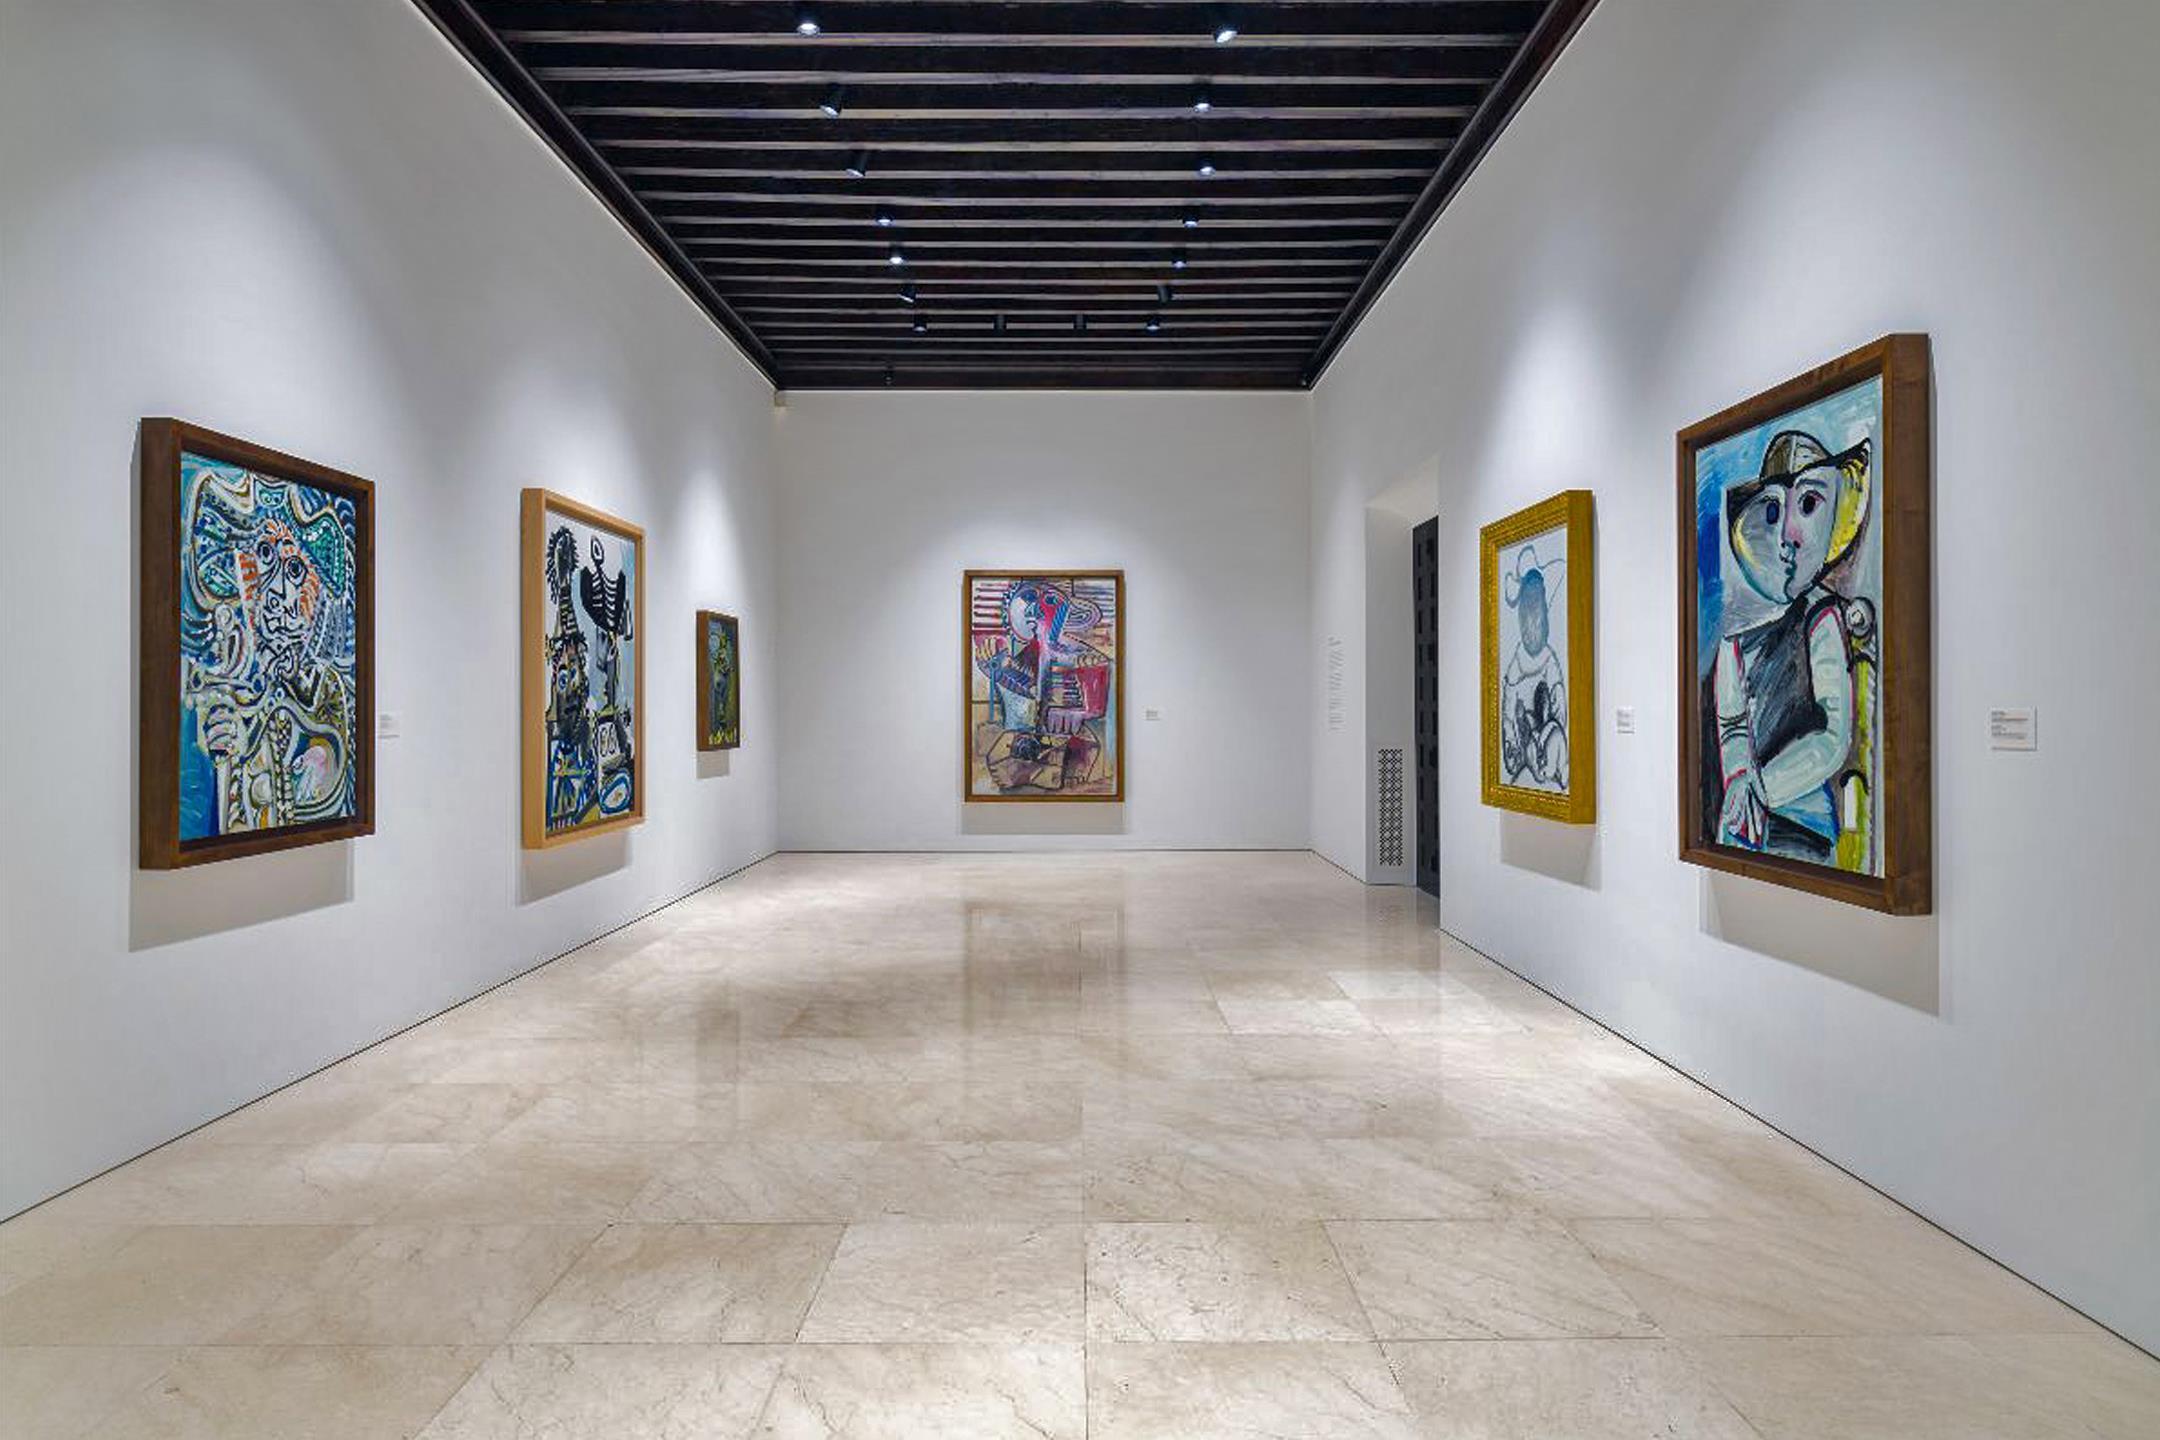 Tour-Museo-Picasso-de-Malaga-2